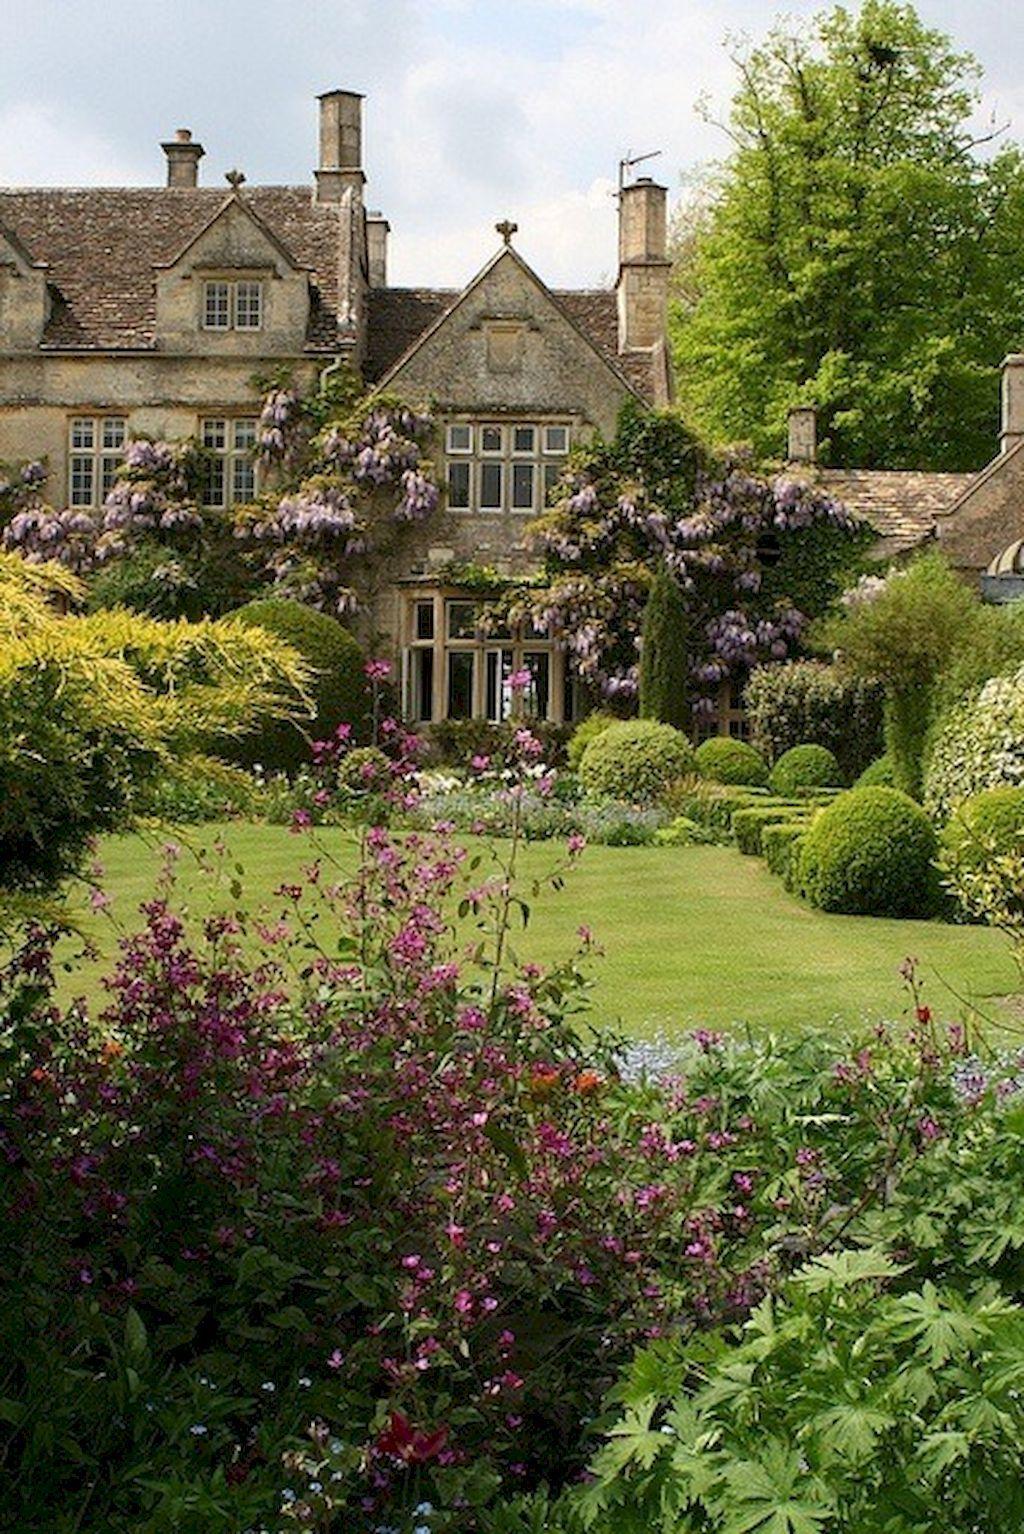 Cool 100 Modern English Country Garden Design Ideas besideroom.com ...